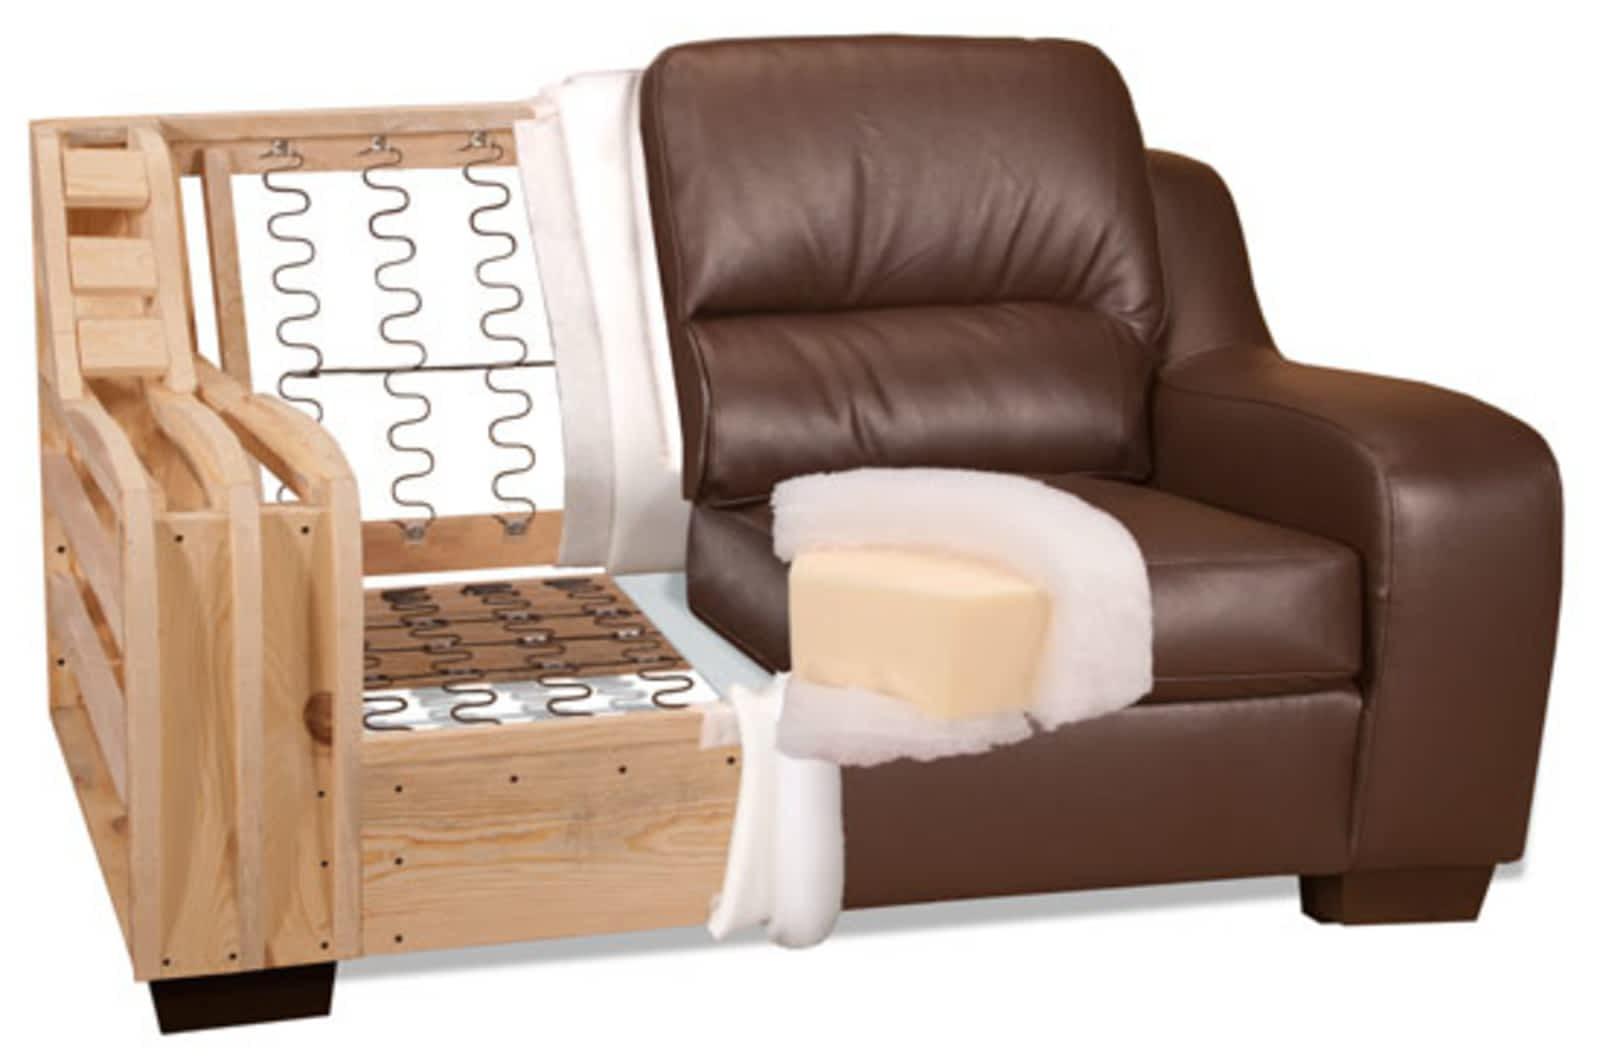 Sofa Manufacturers Brampton | Taraba Home Review